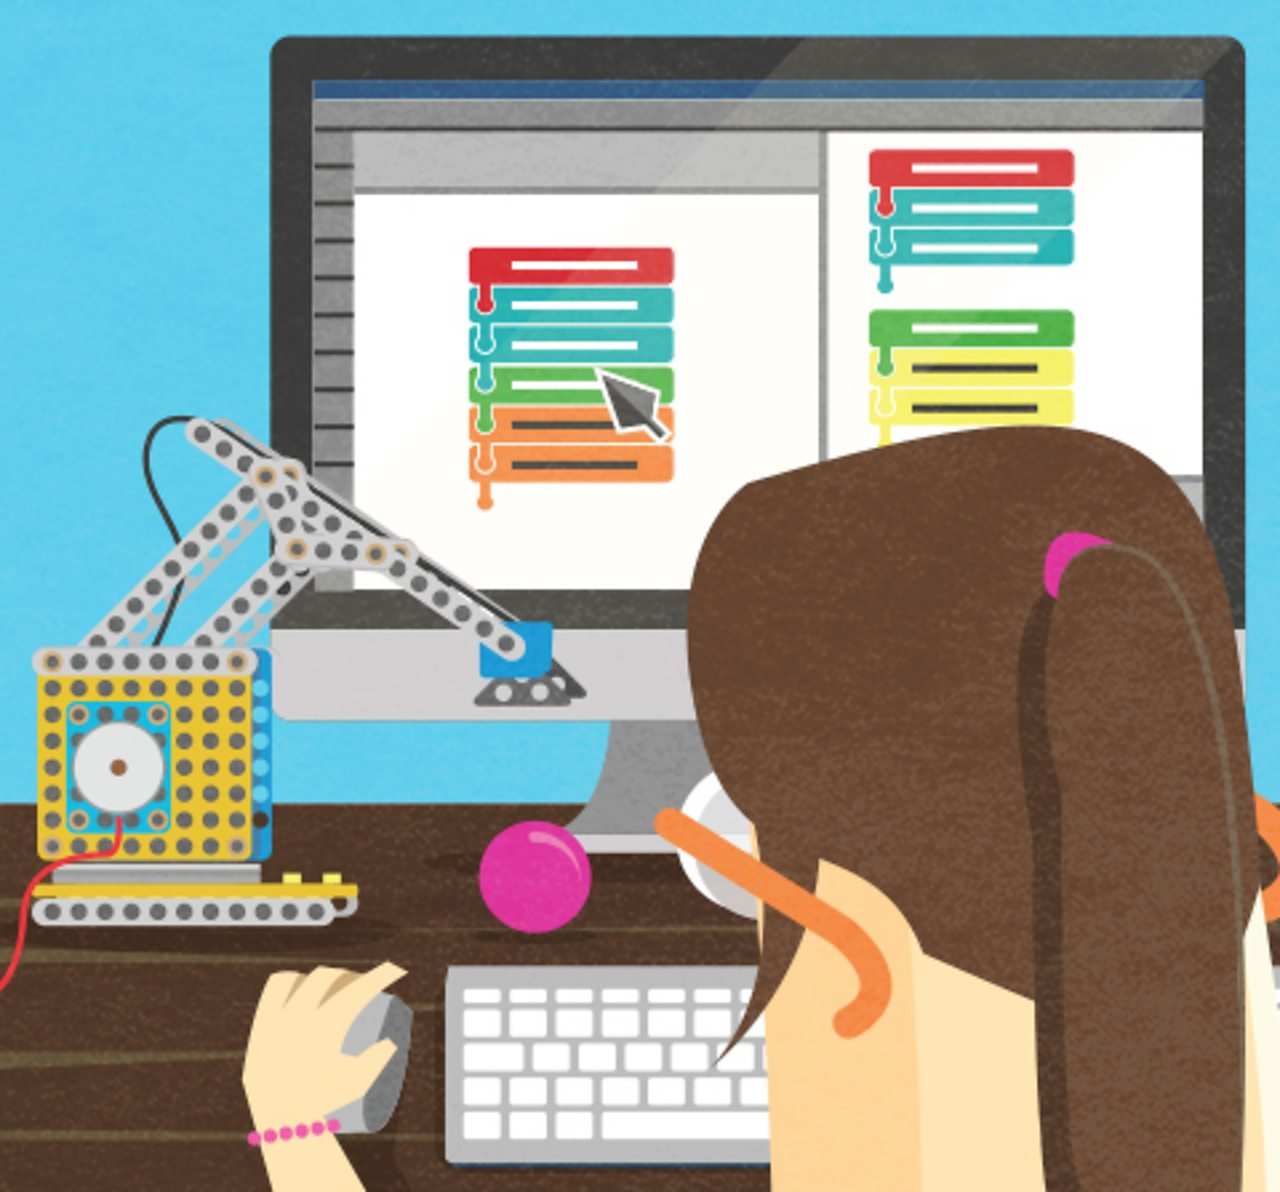 An illustration of a computer programmer at a computer